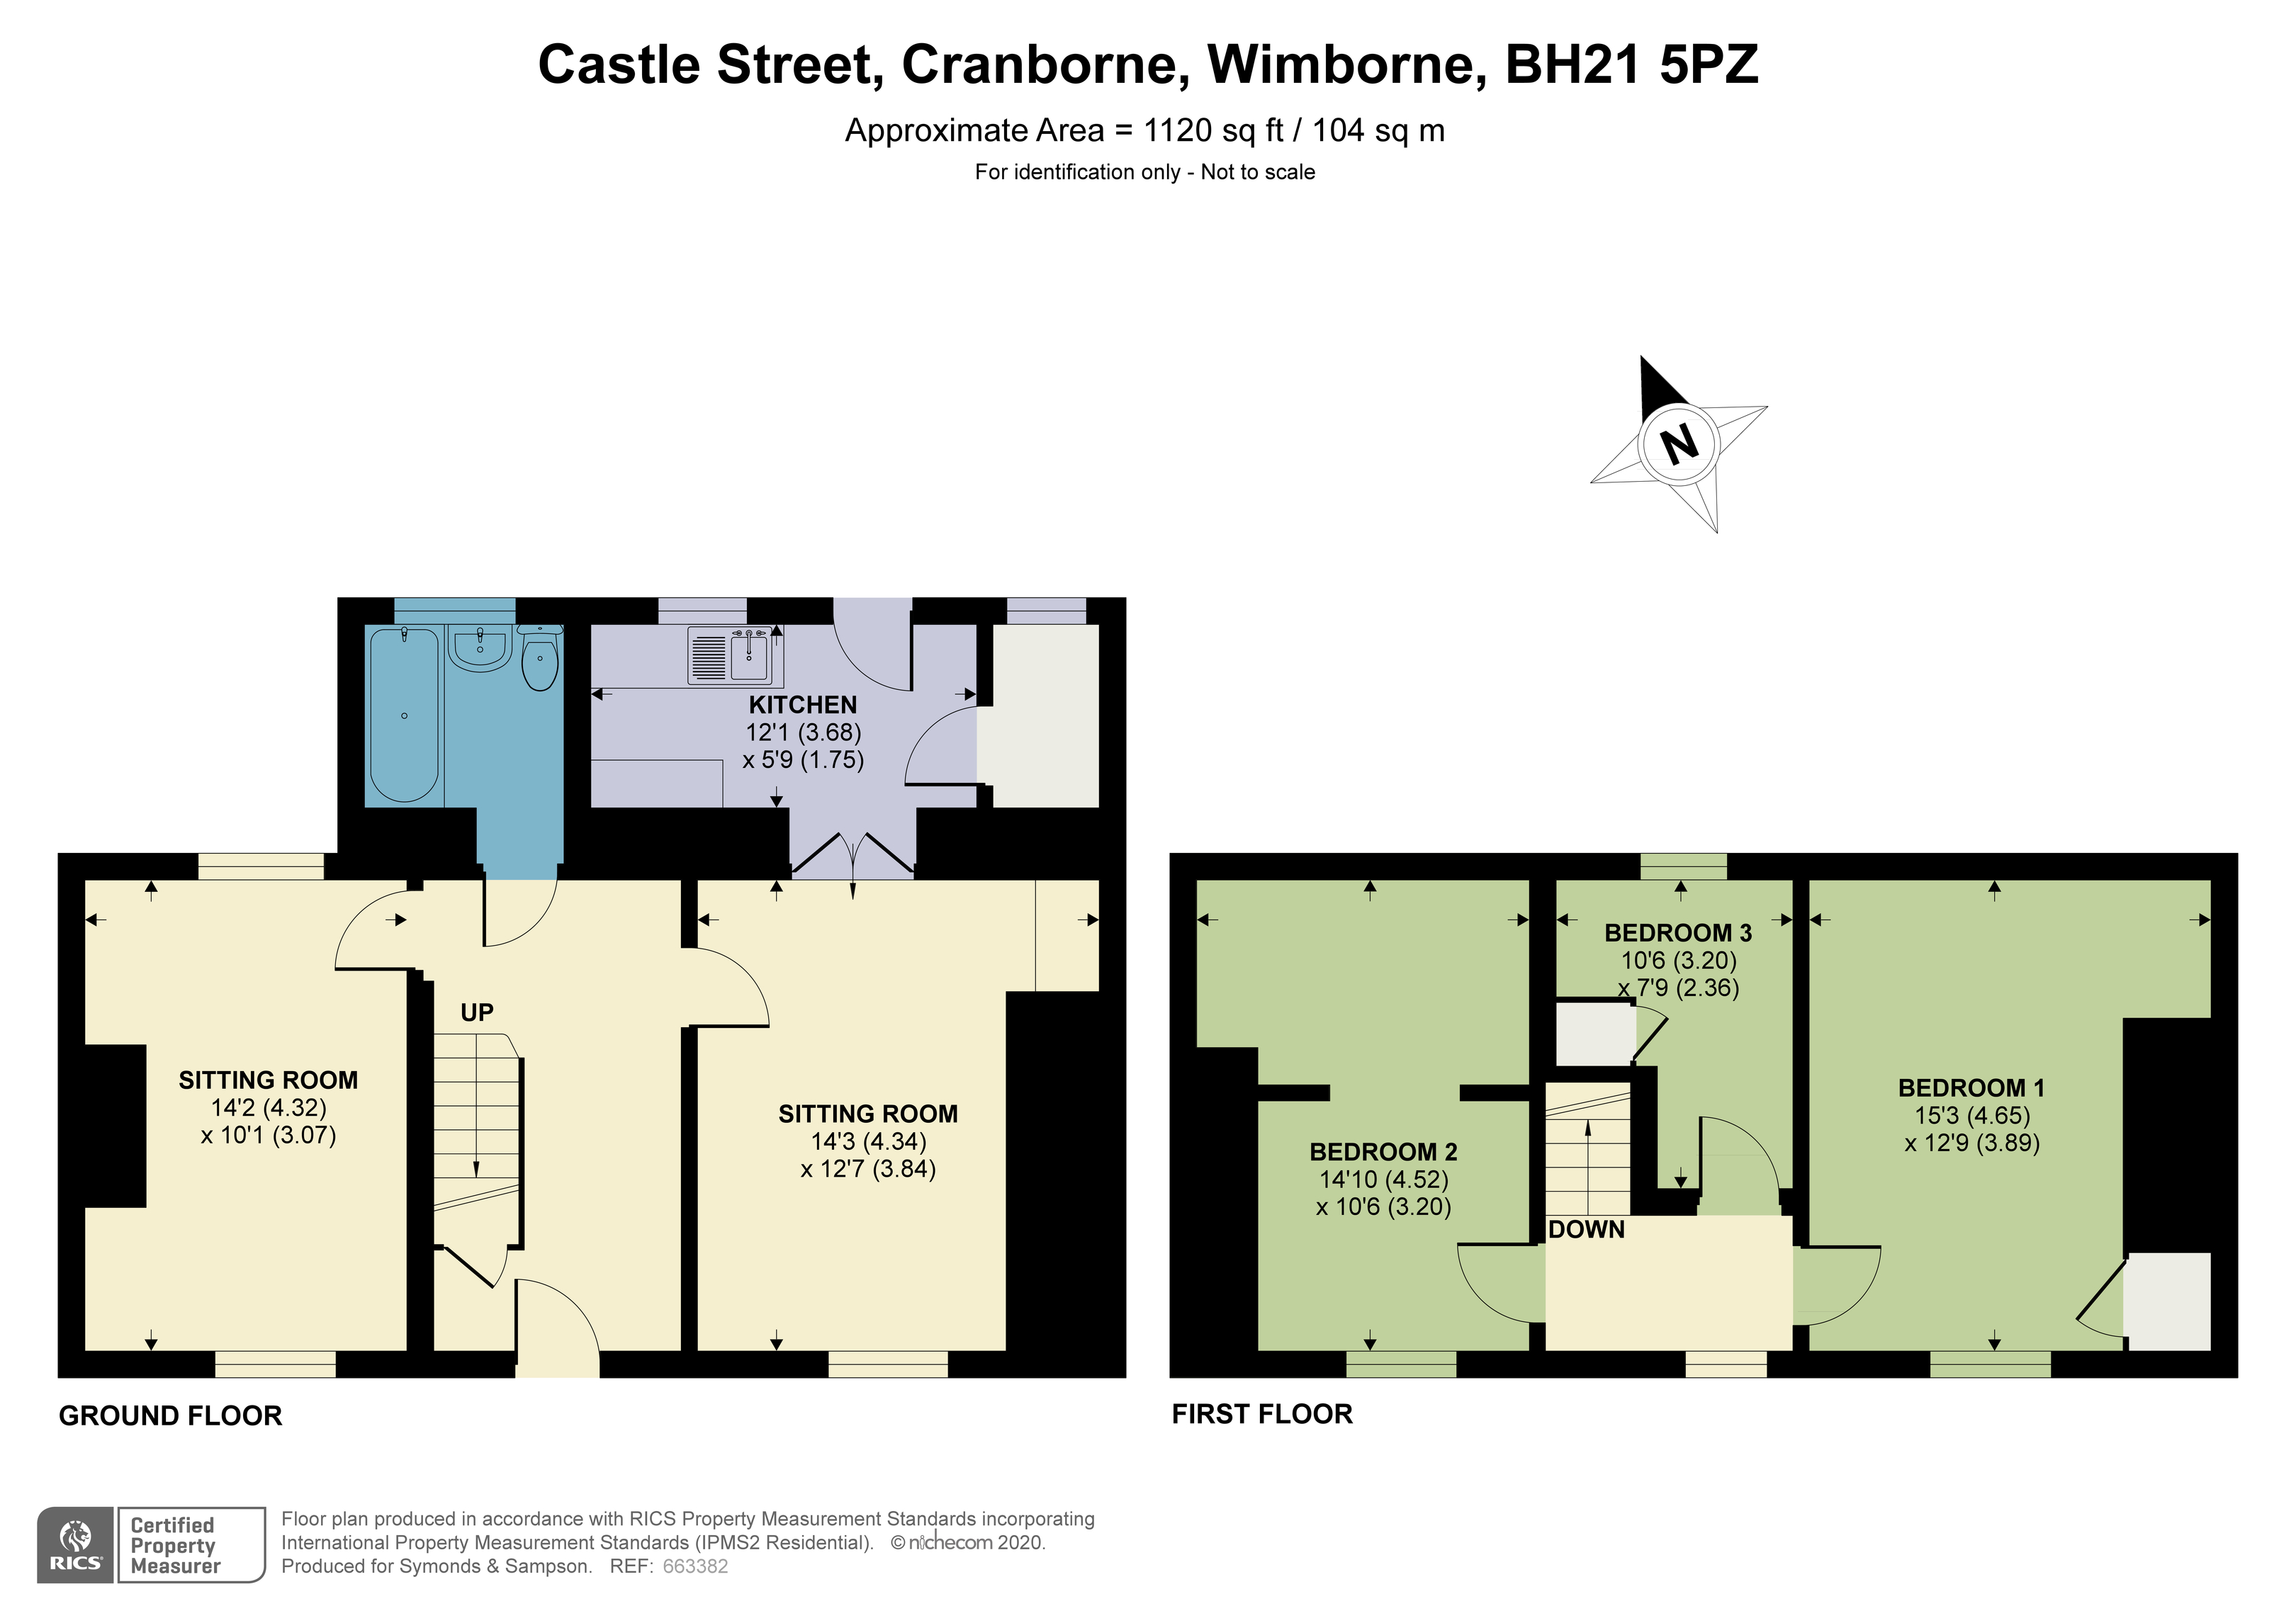 Floorplan - Castle Street, Cranborne, Wimborne, BH21 5PZ